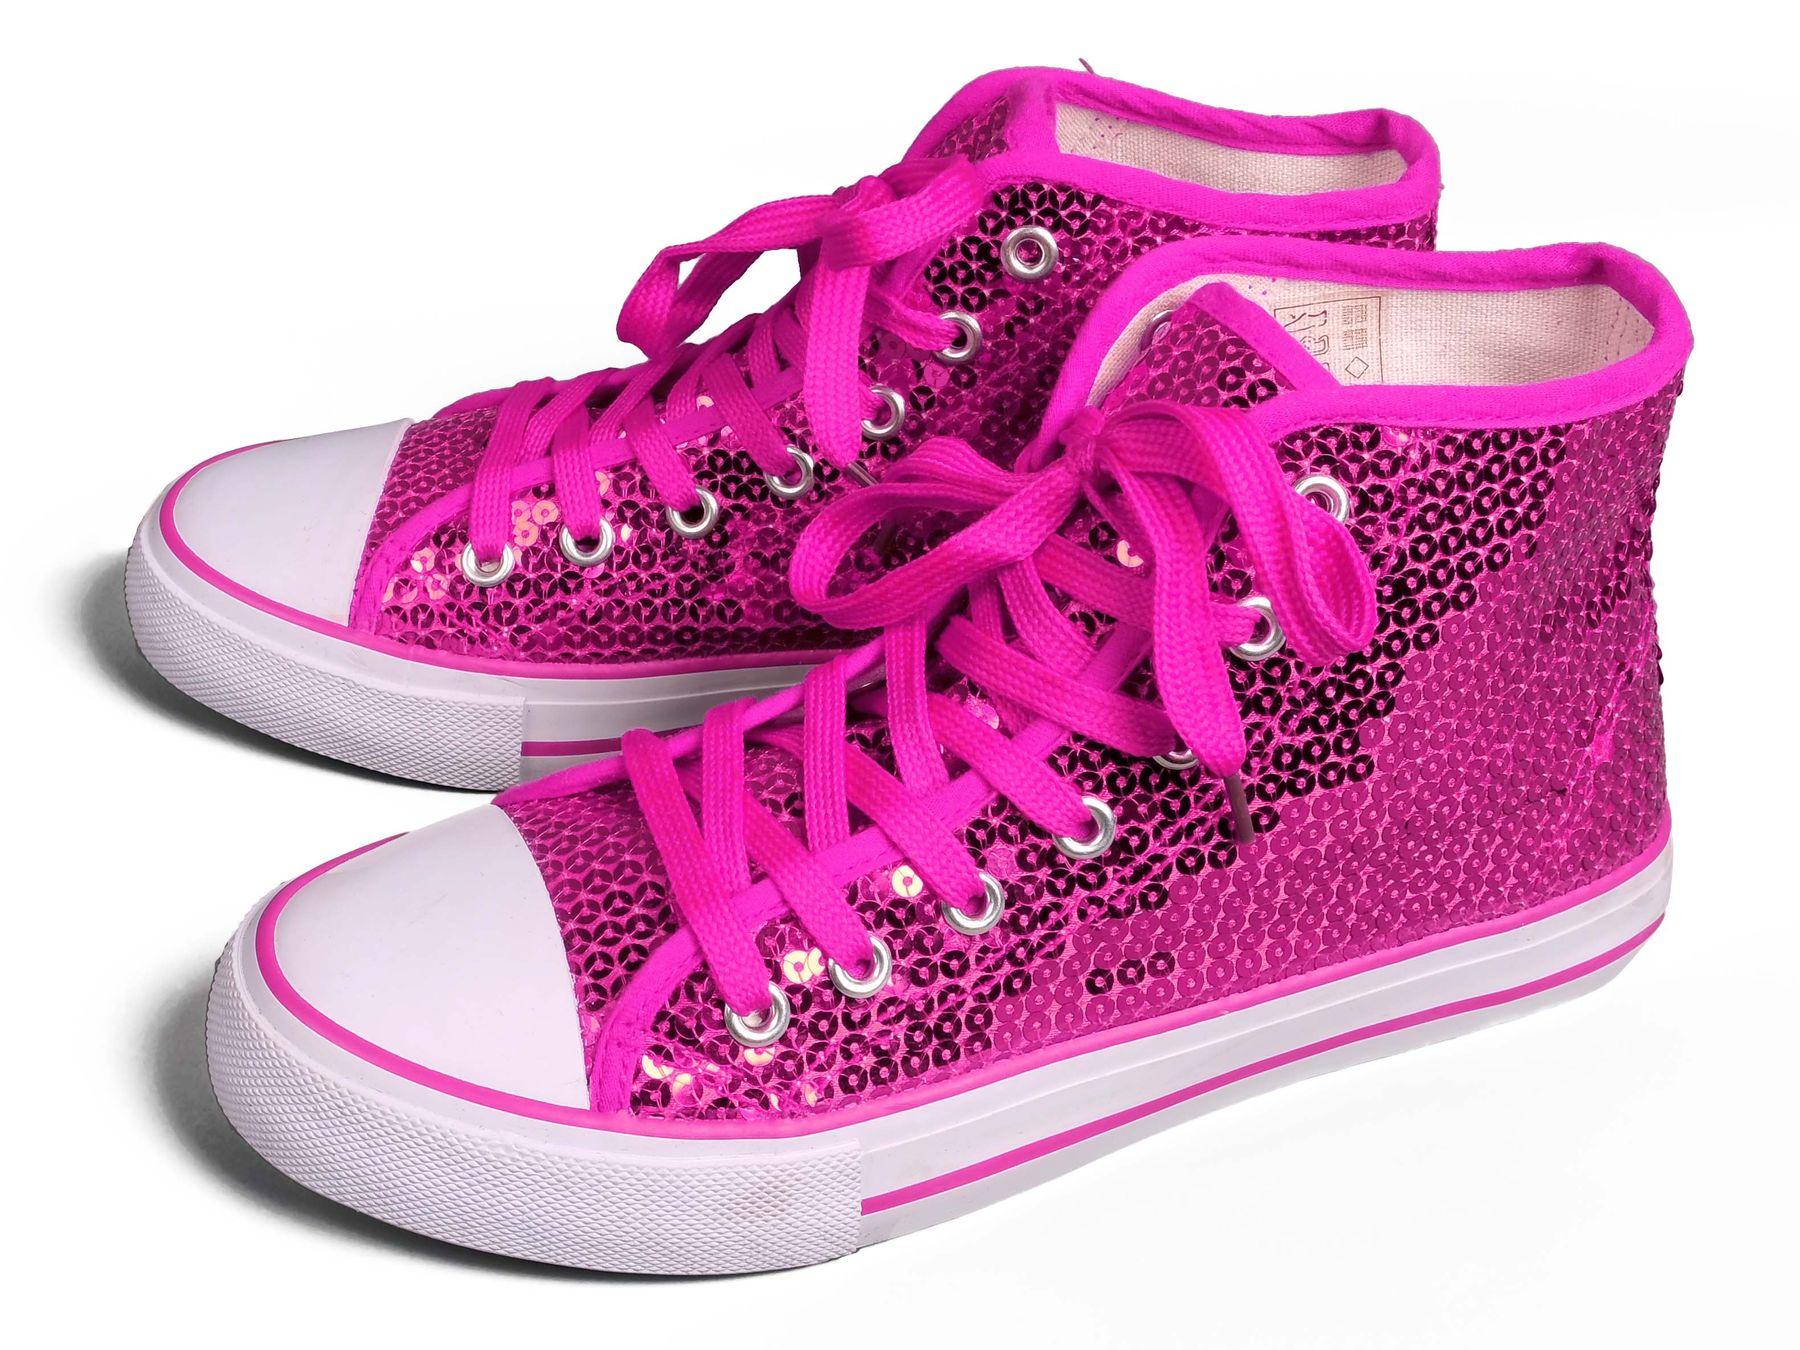 Schuhe | VANGRAAF.COM